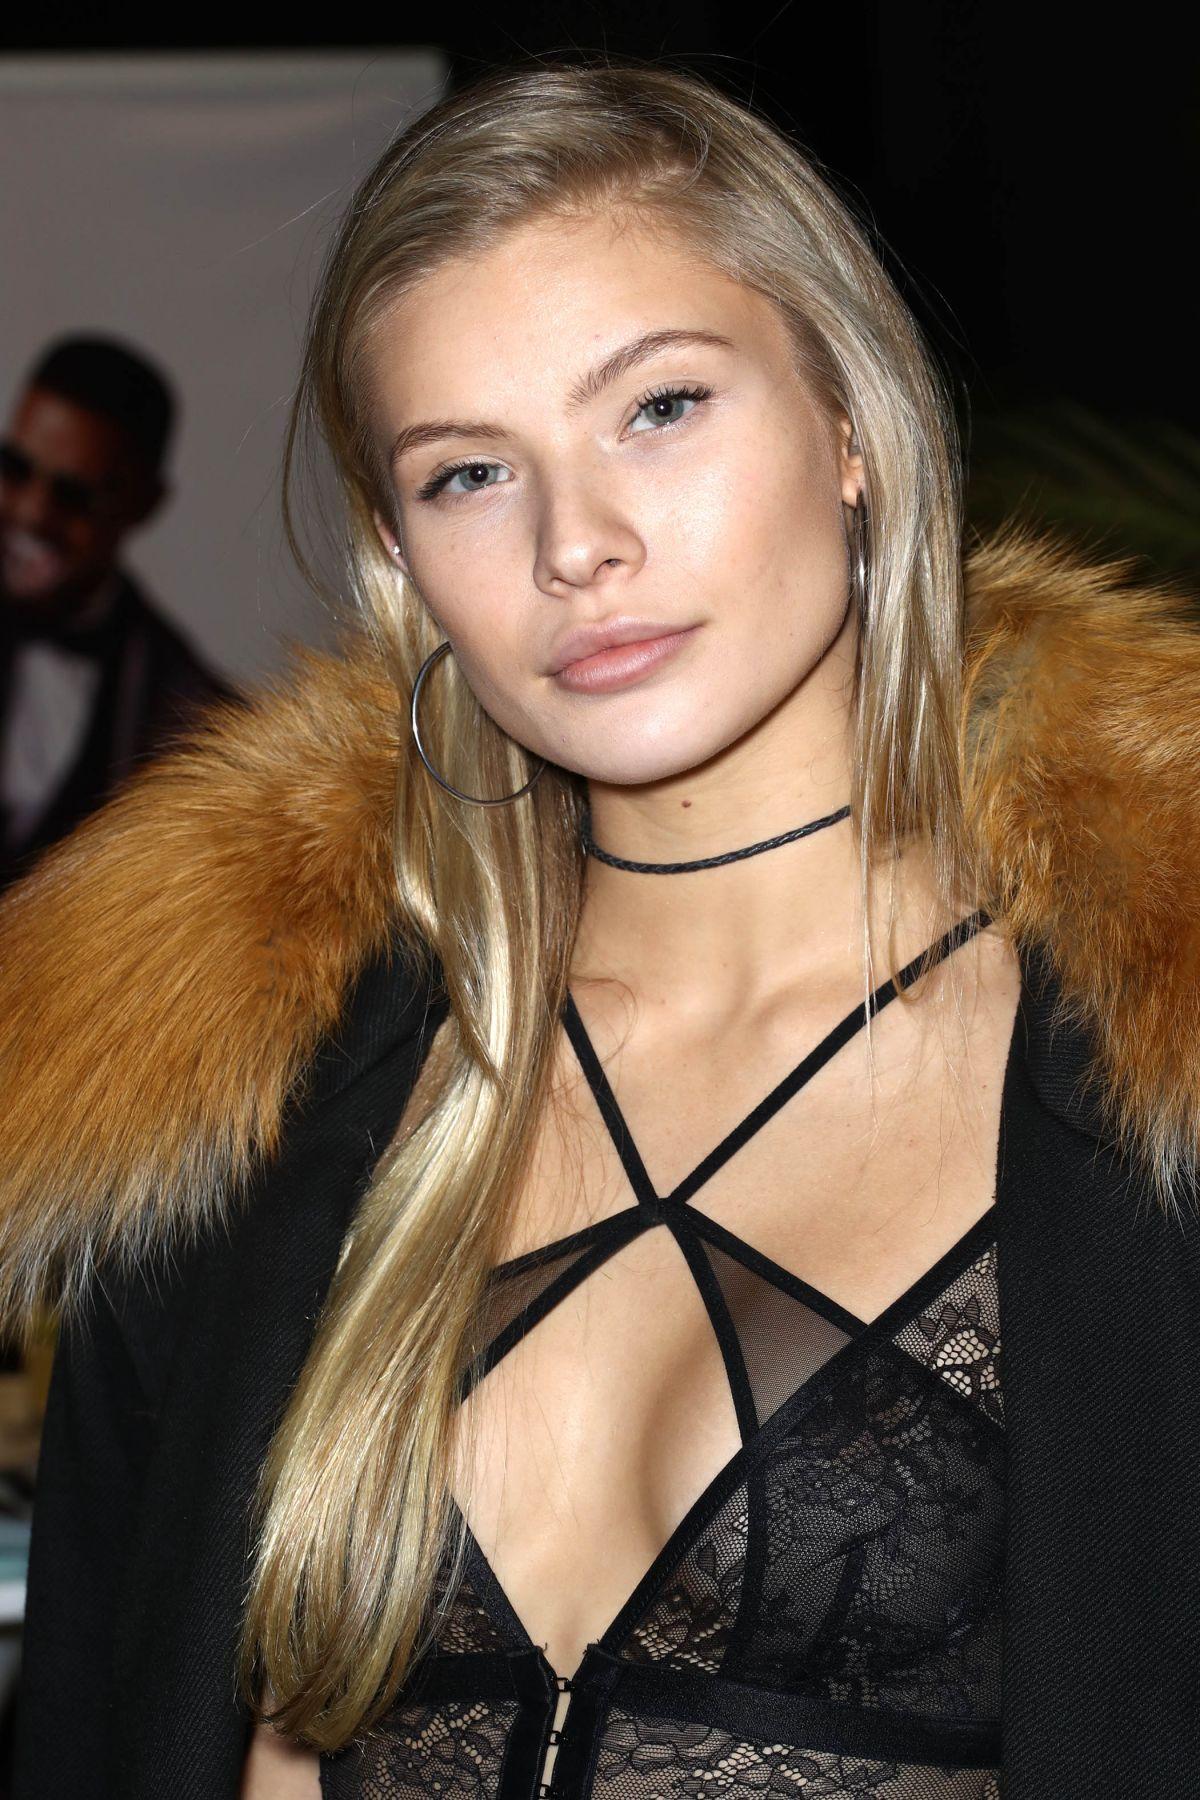 2019 Josie Marie Canseco nudes (41 photo), Pussy, Bikini, Feet, cleavage 2006